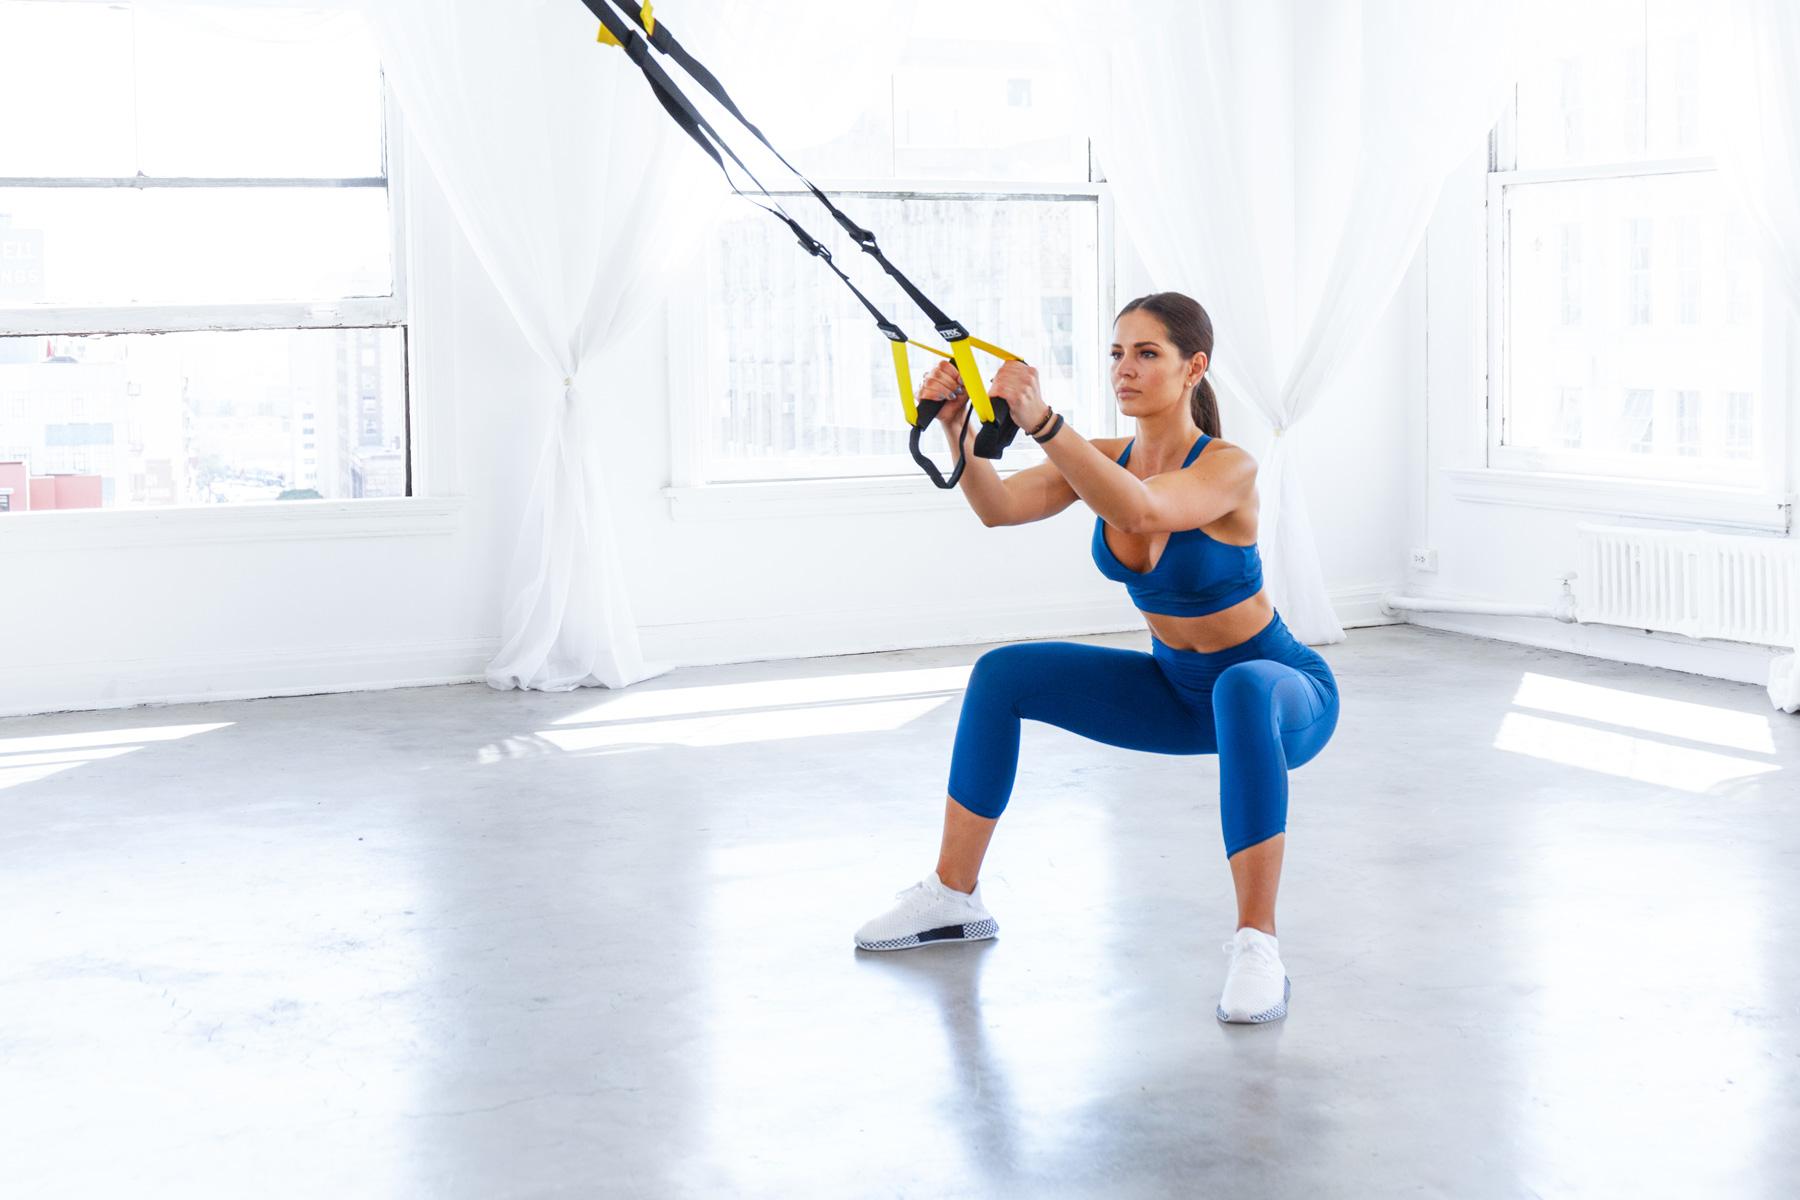 Transform in 30 - 56 day FitplanTrain 4x/week30 min workout